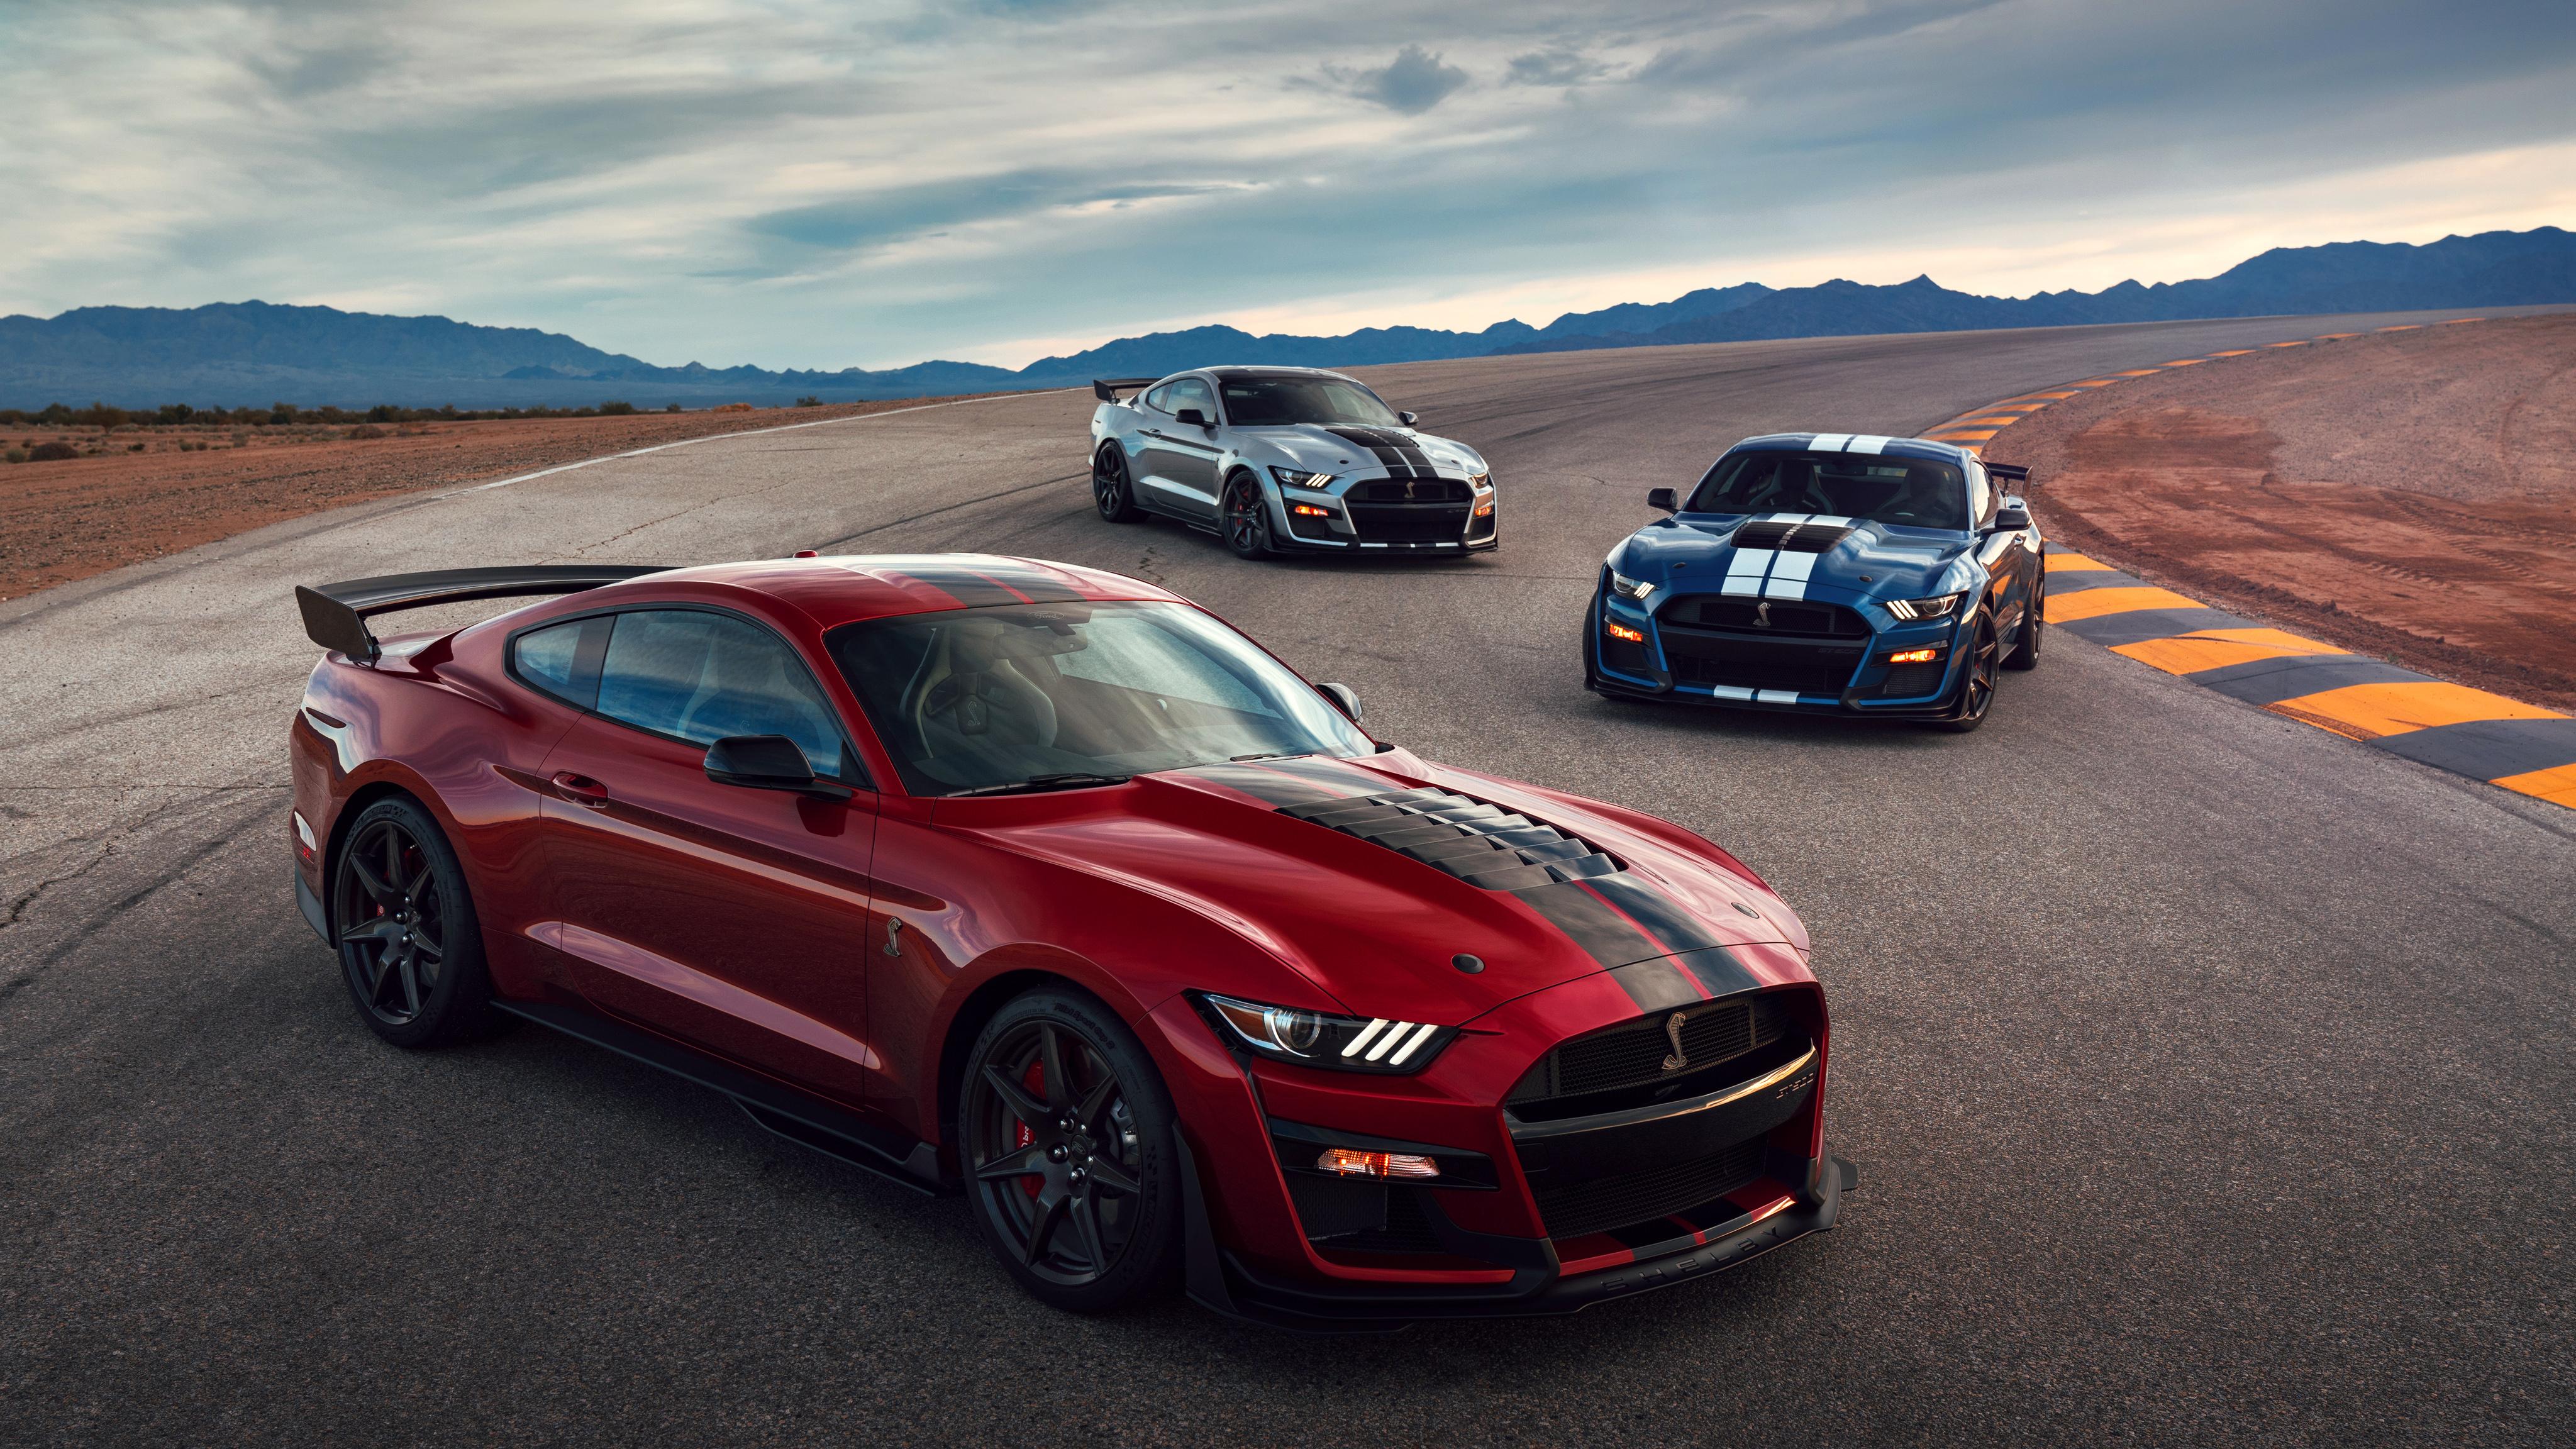 Ford Mustang Wallpaper 2020